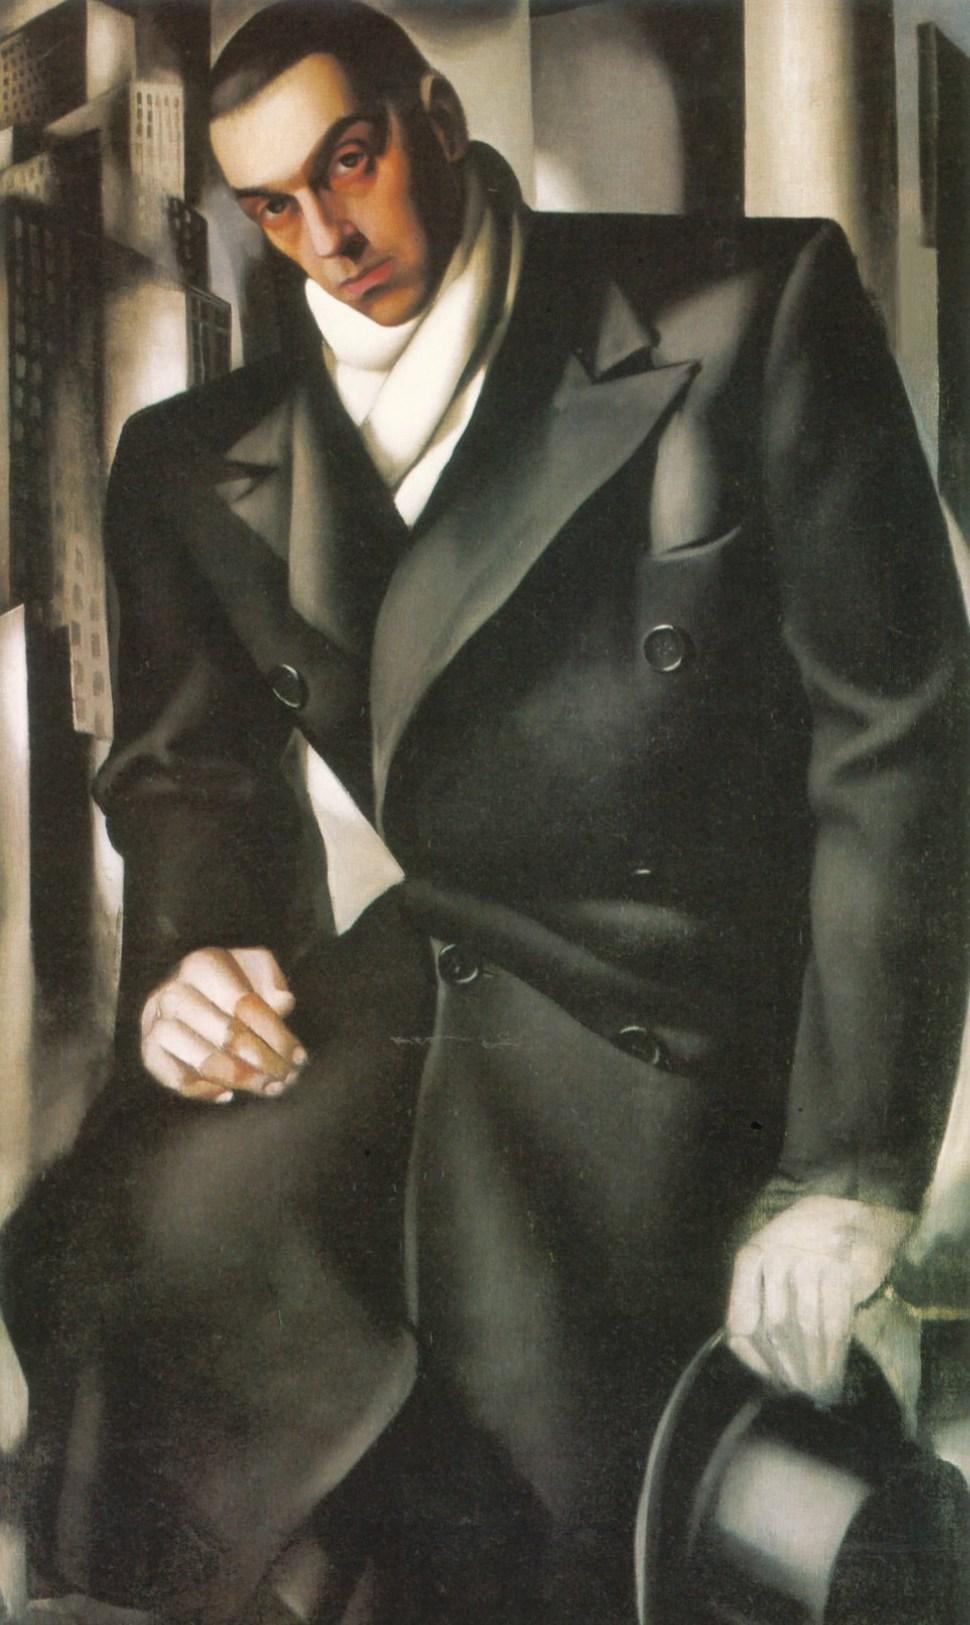 Tadeusz Lempitski (Portrait of a Man, Unfinished), 1928